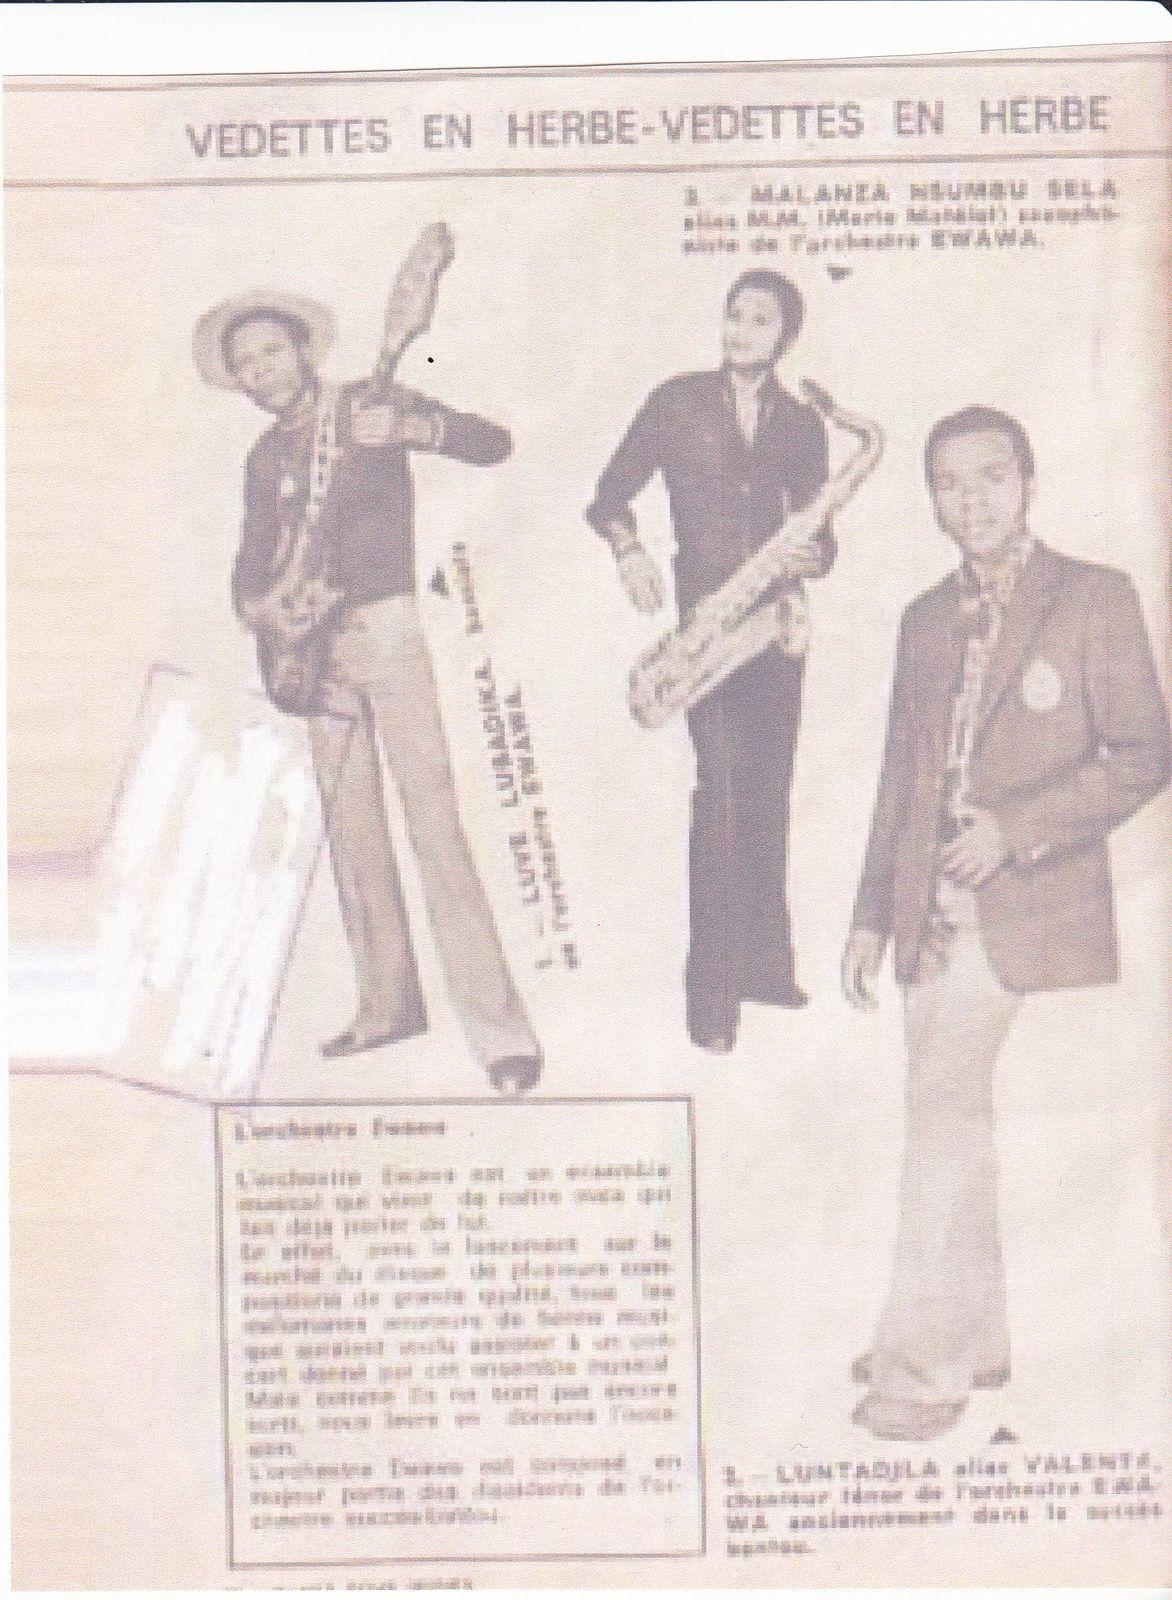 Lubadika avec sa guitare, Matalanza avec son saxo, et Luntadila Valenta alors musiciens de l'orchestre Ewawa de Malph